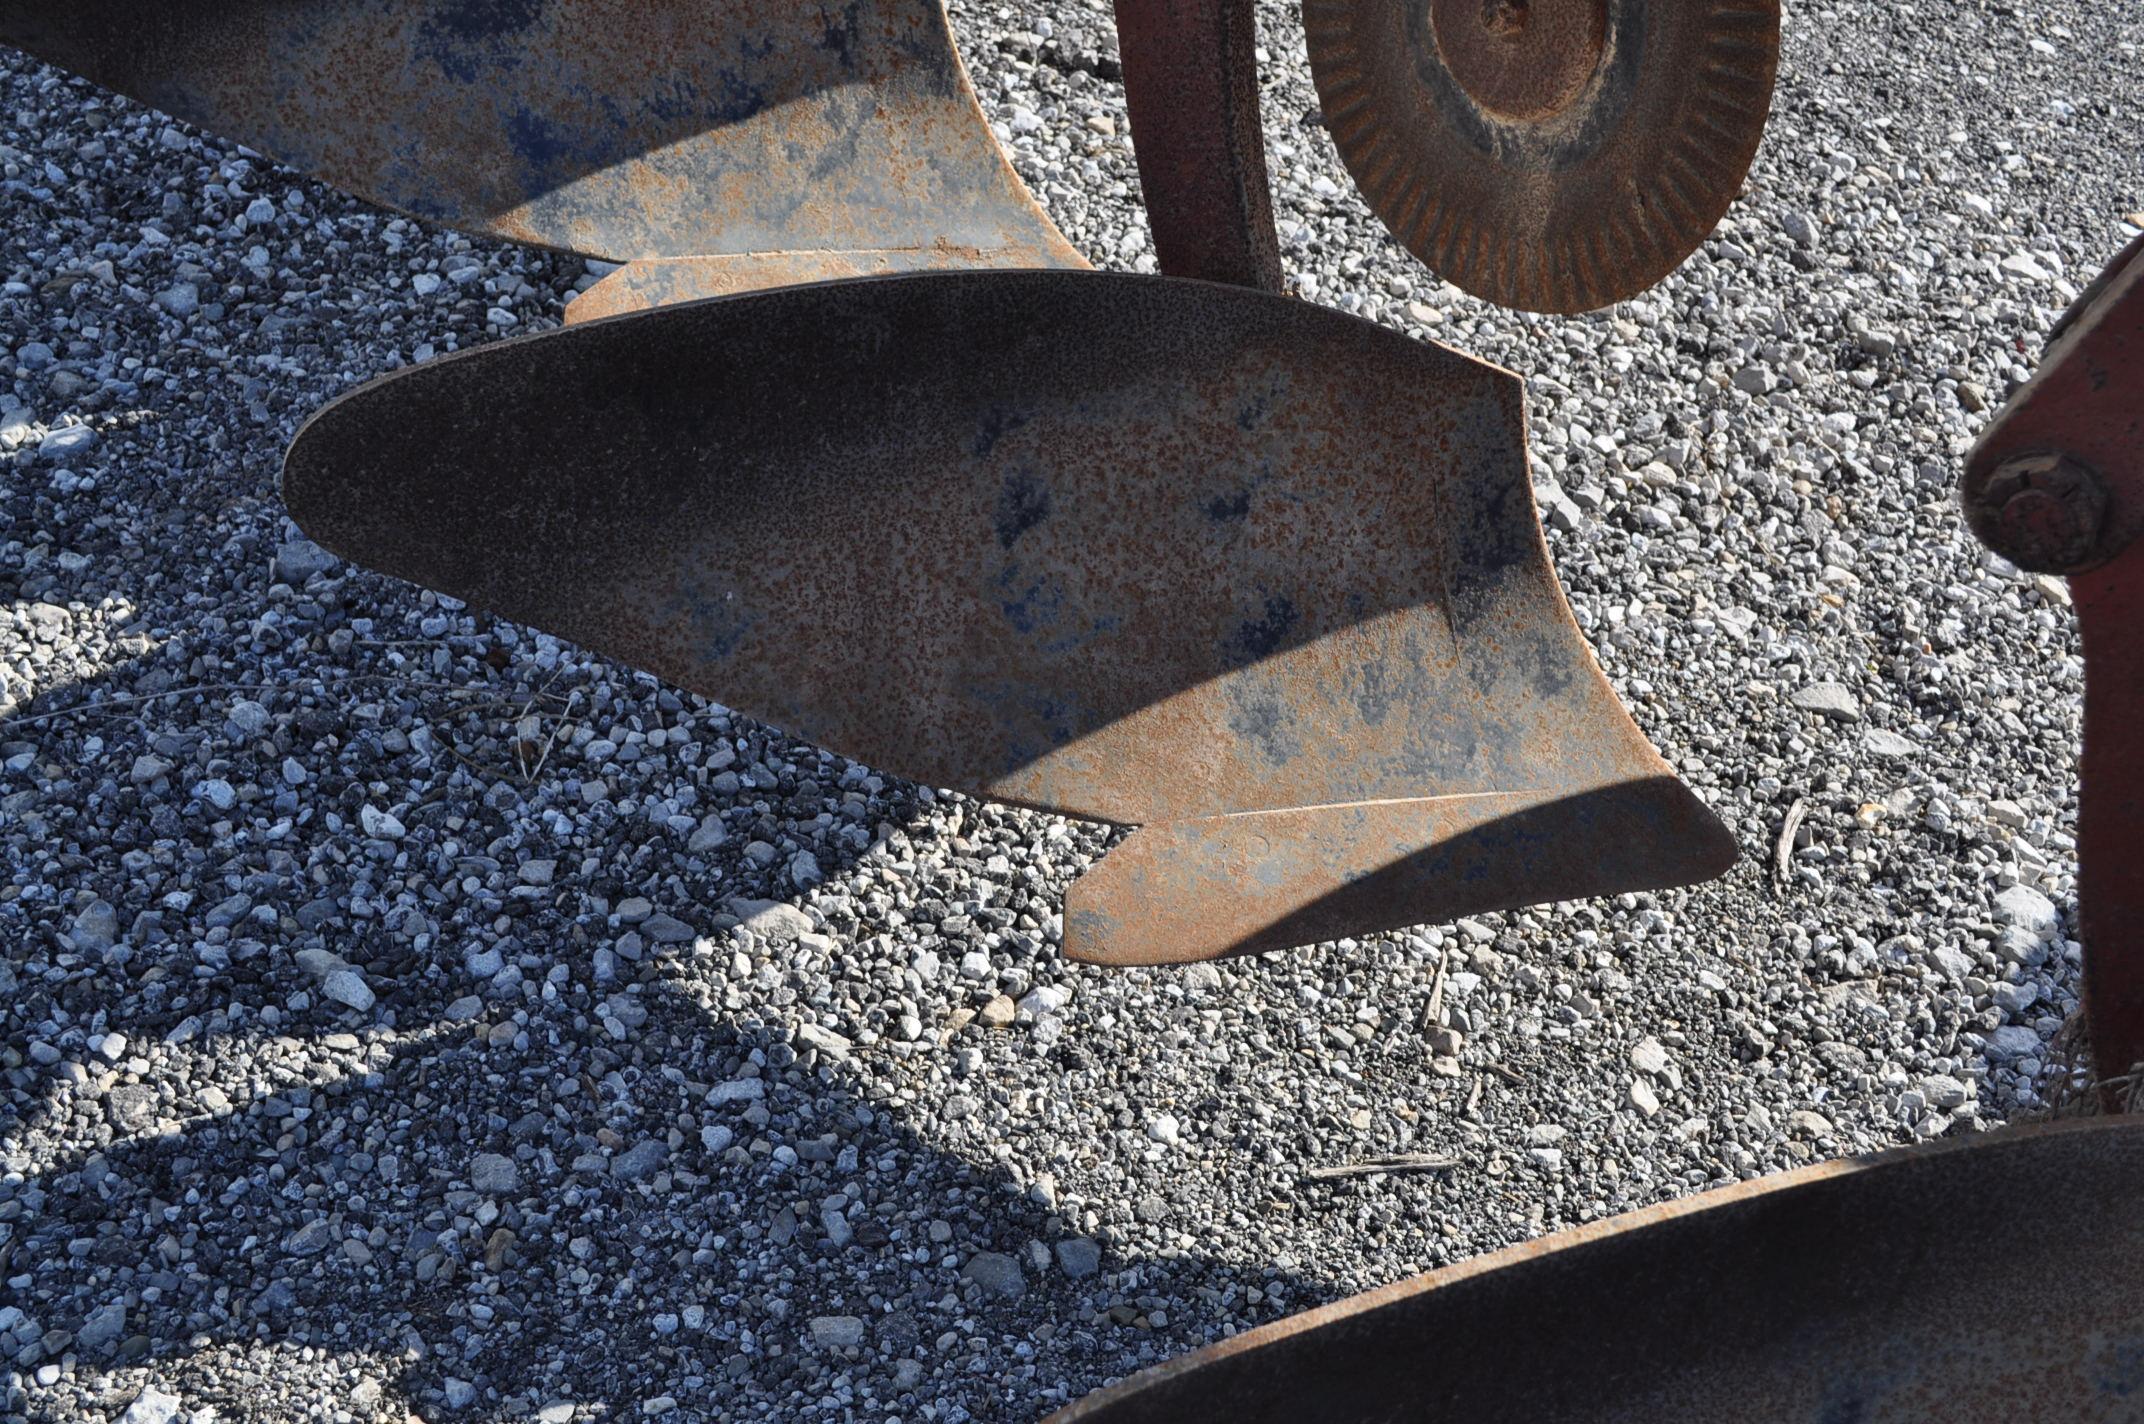 International 700 onland moldboard plow, 7 btm, auto reset trip - Image 11 of 16